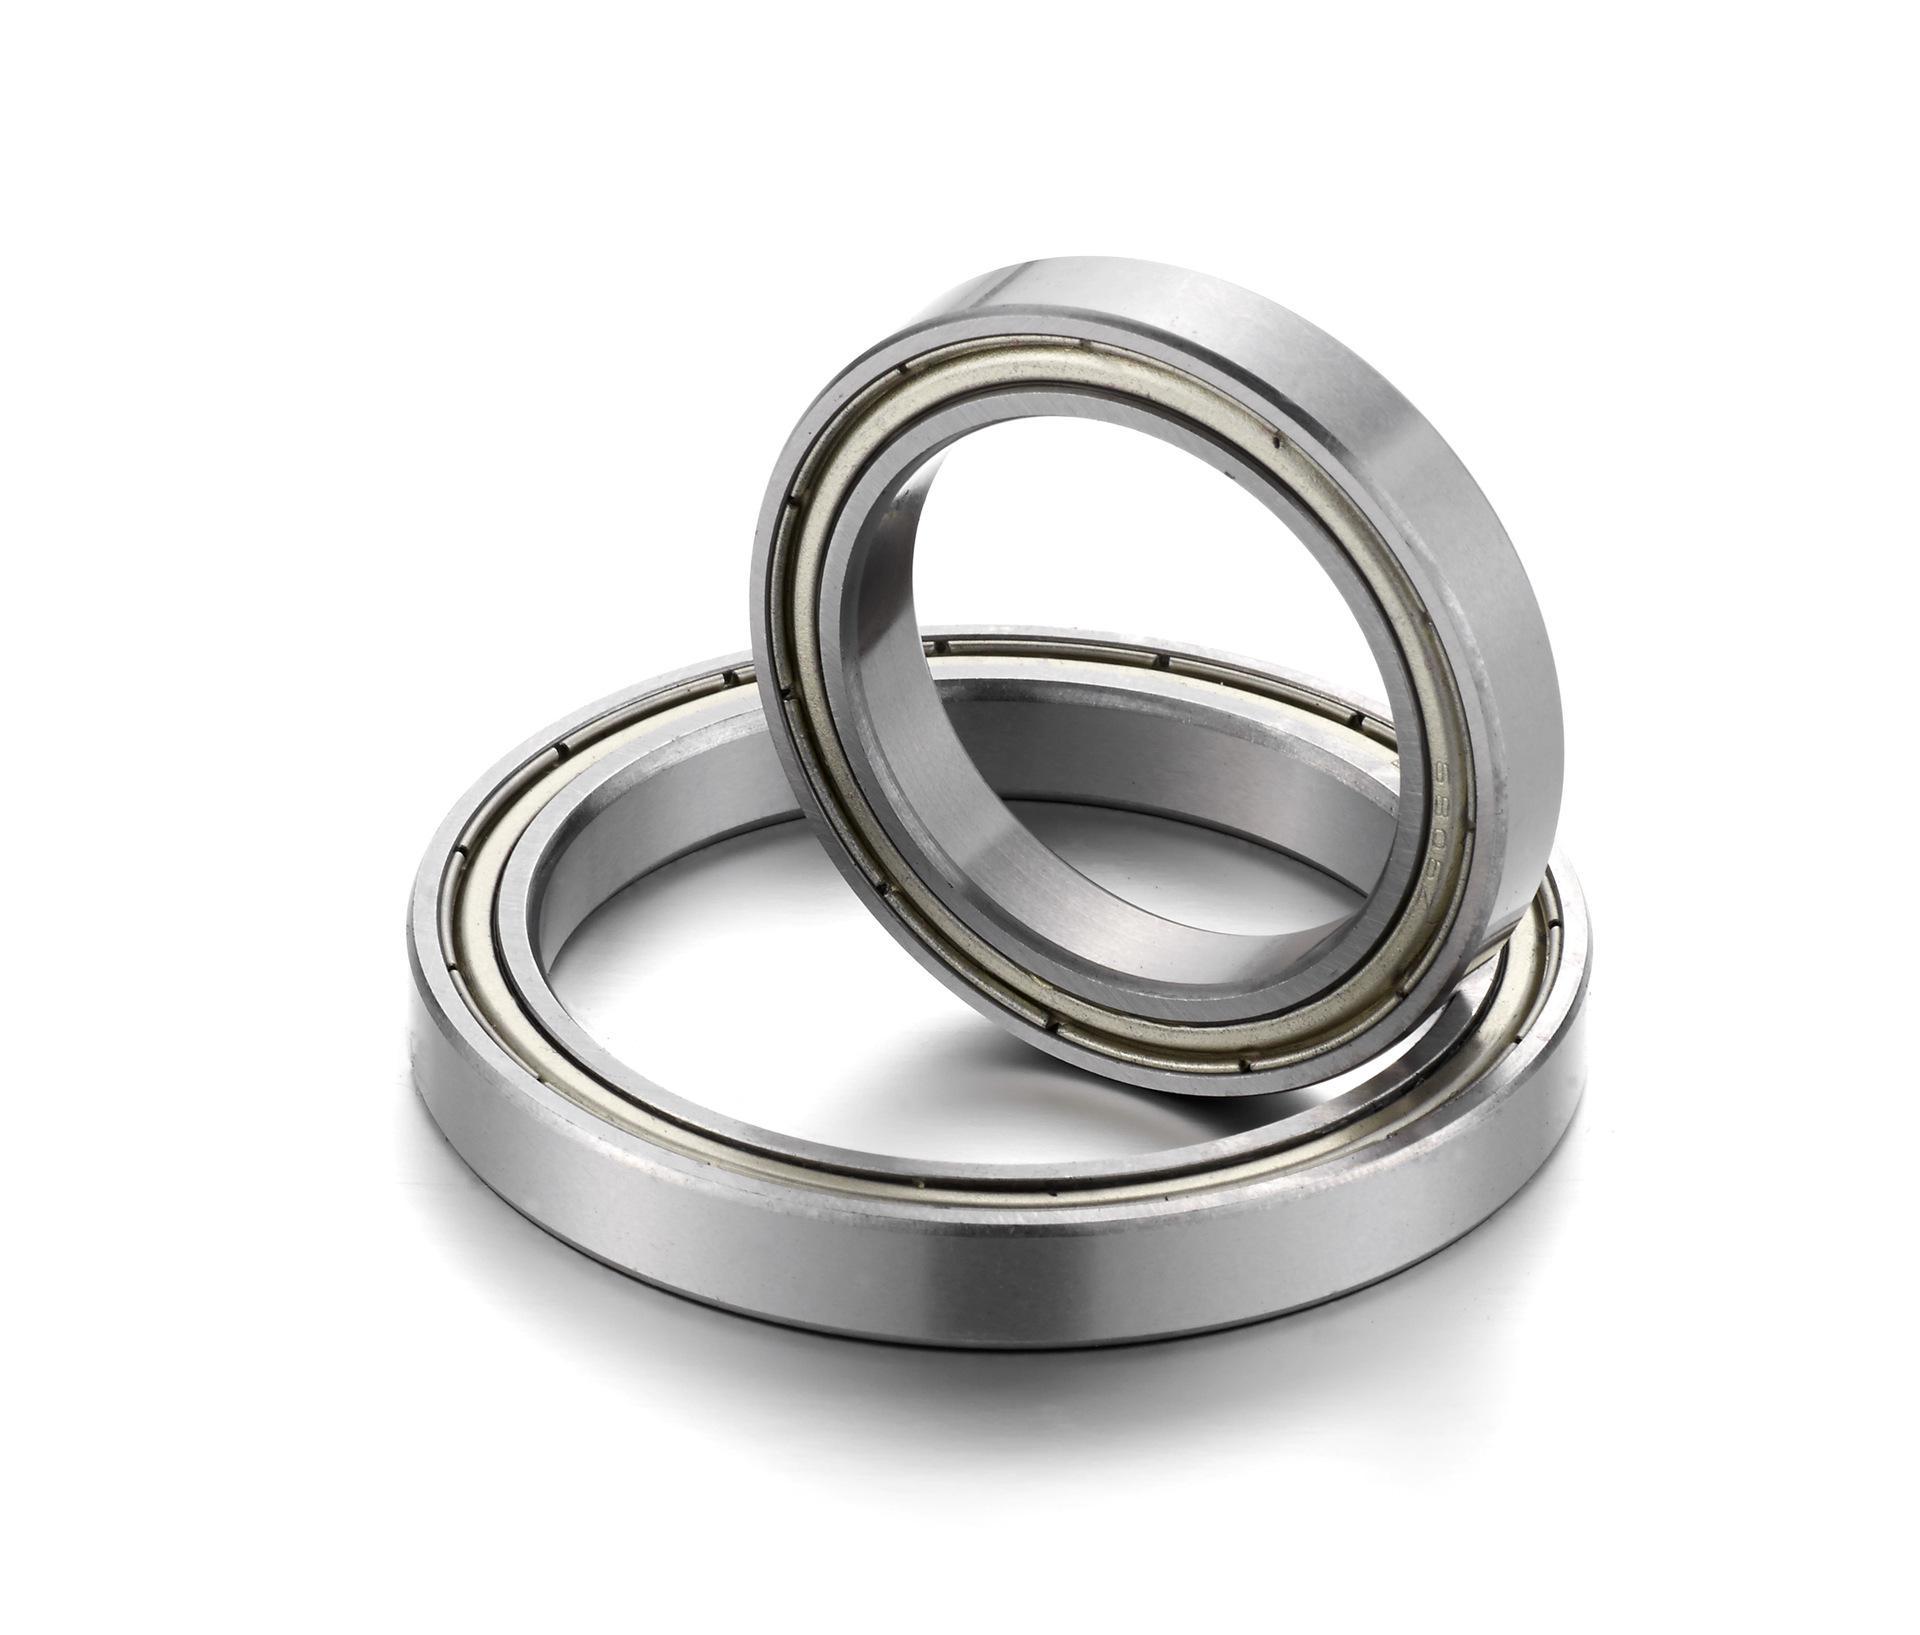 6828M  ABEC-1 140x175x18MM Metric Thin Section Bearings 61828M brass cage 1pcs 71901 71901cd p4 7901 12x24x6 mochu thin walled miniature angular contact bearings speed spindle bearings cnc abec 7